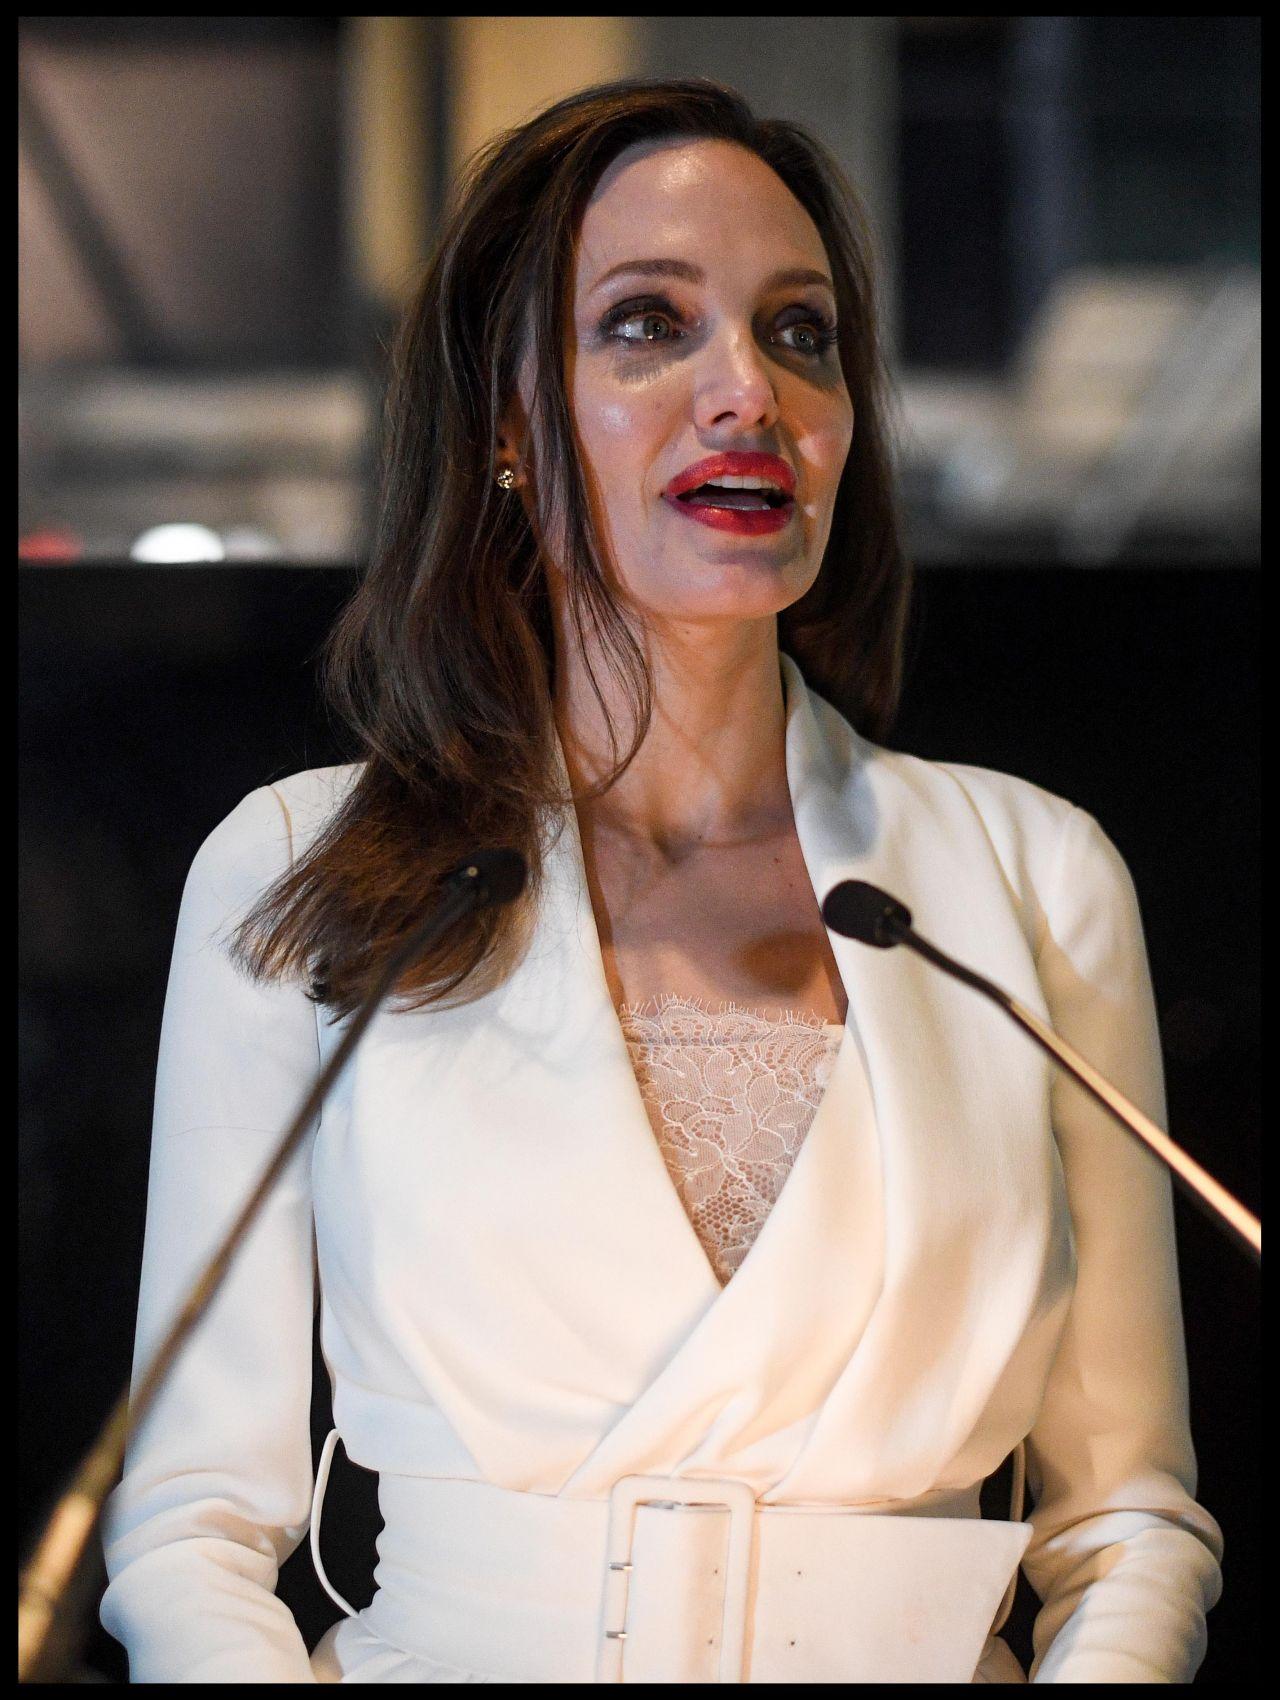 https://celebmafia.com/wp-content/uploads/2018/11/angelina-jolie-fighting-stigma-through-film-in-london-11-23-2018-1.jpg